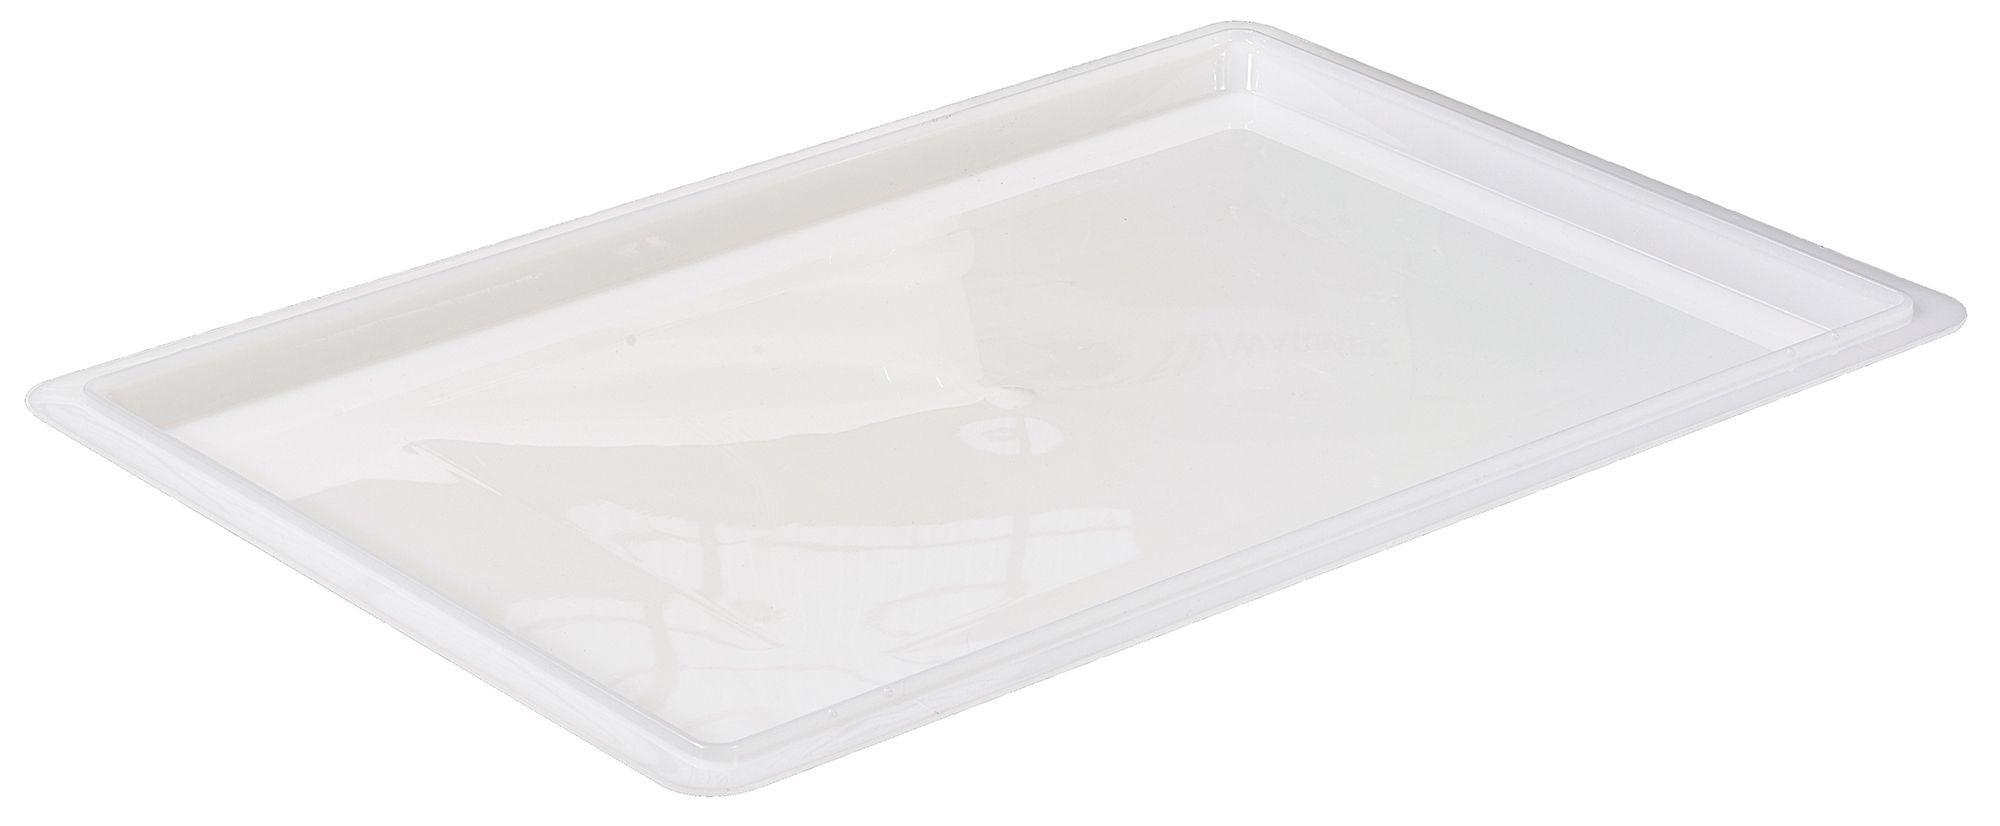 2700-820 Winco White Food Box Cover Lid 18x26